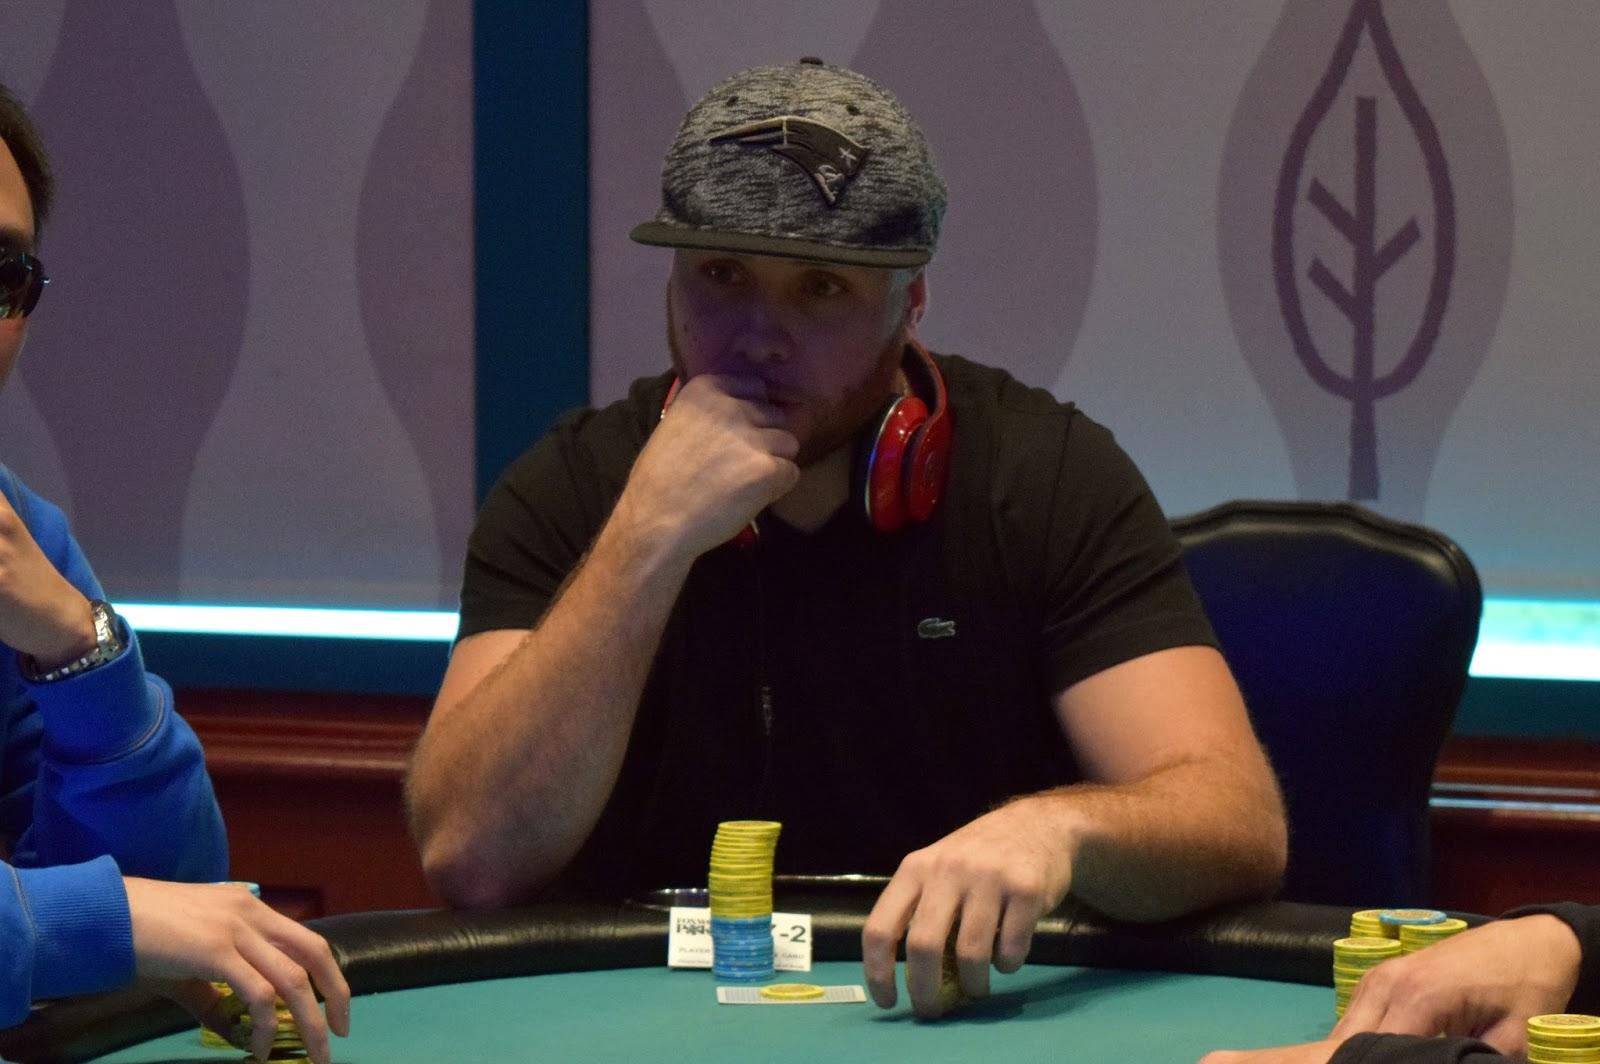 Pirate poker run lake lanier 2015